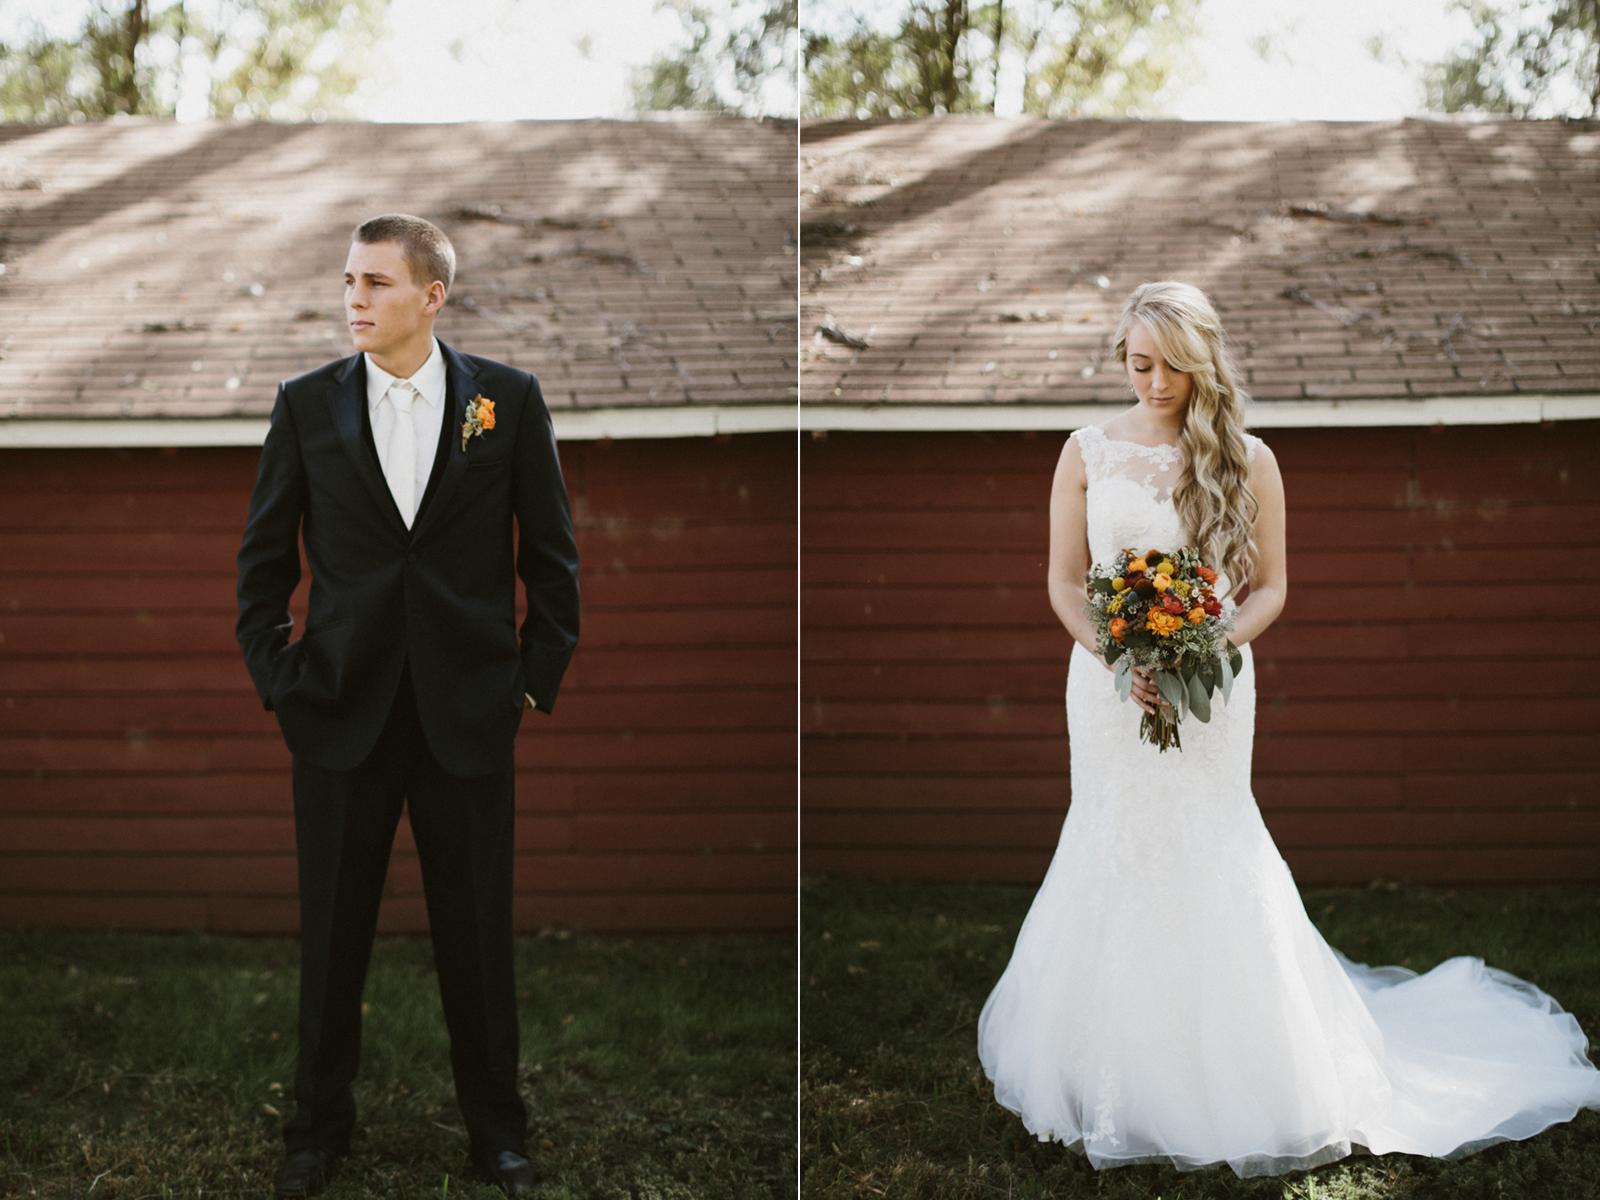 SiouxFalls_DesMoines_Wedding_Photographer_17.jpg